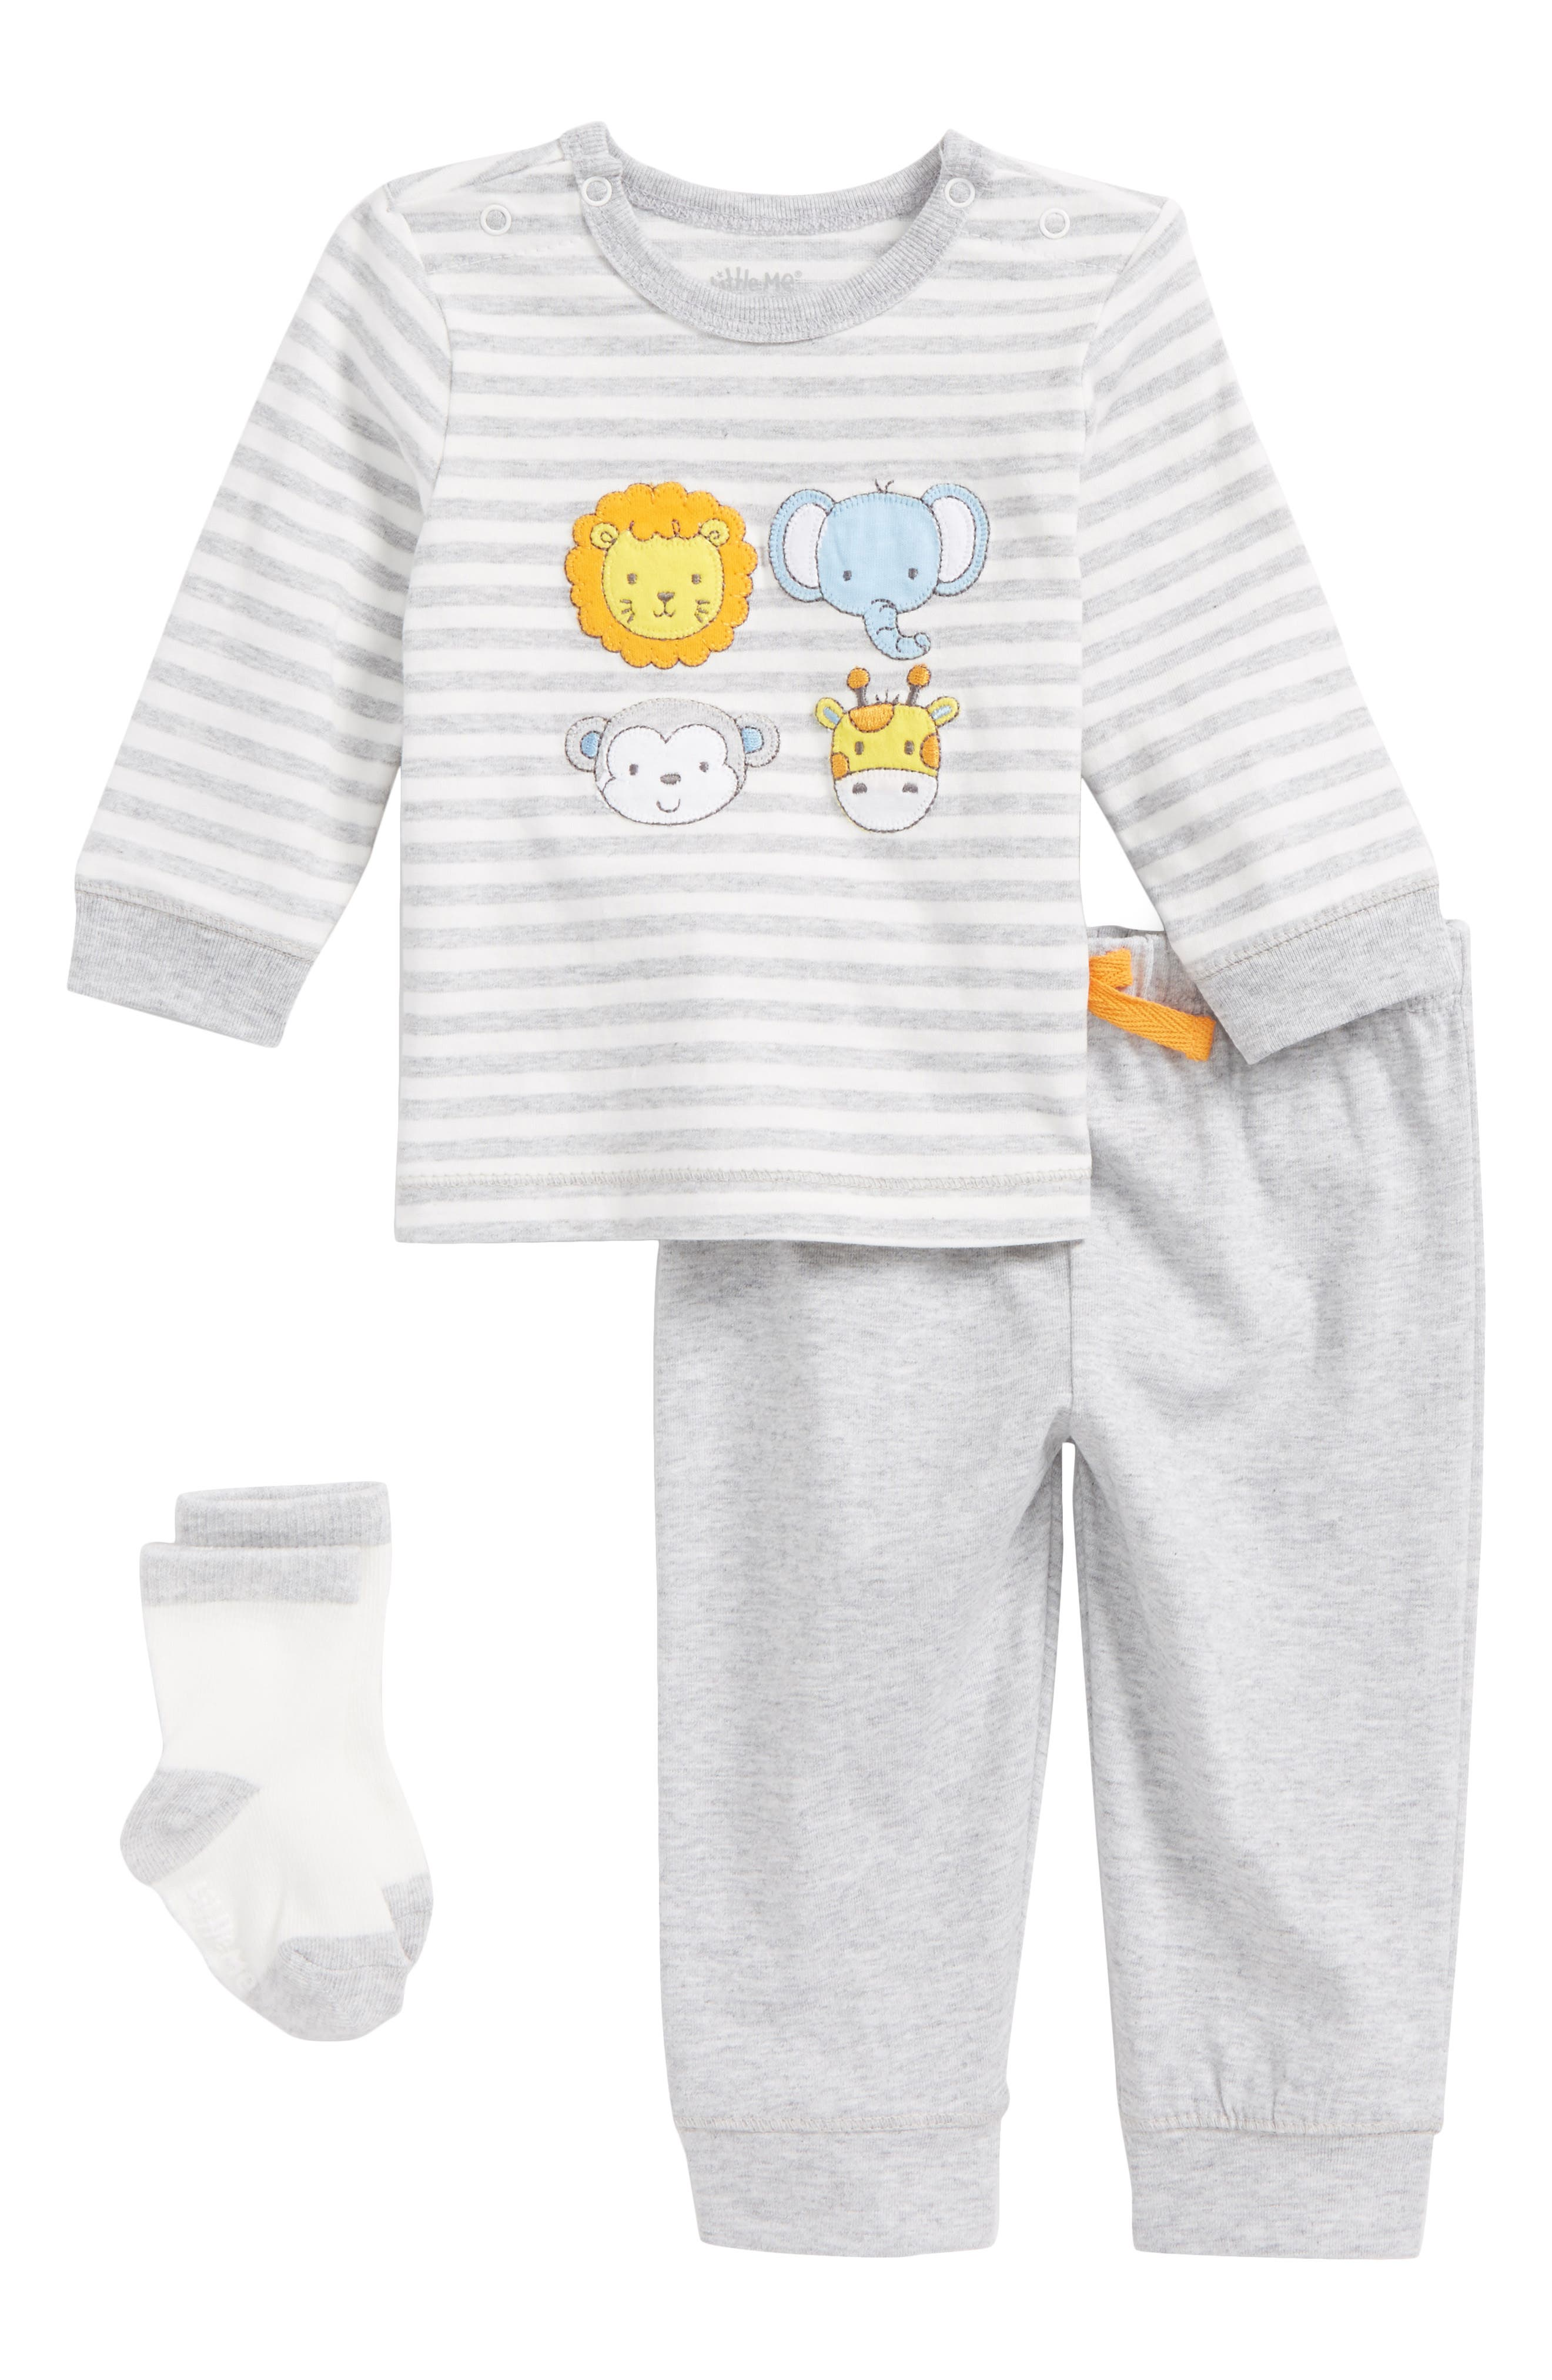 Safari Pals T-Shirt, Jogger Pants & Socks Set,                             Main thumbnail 1, color,                             030